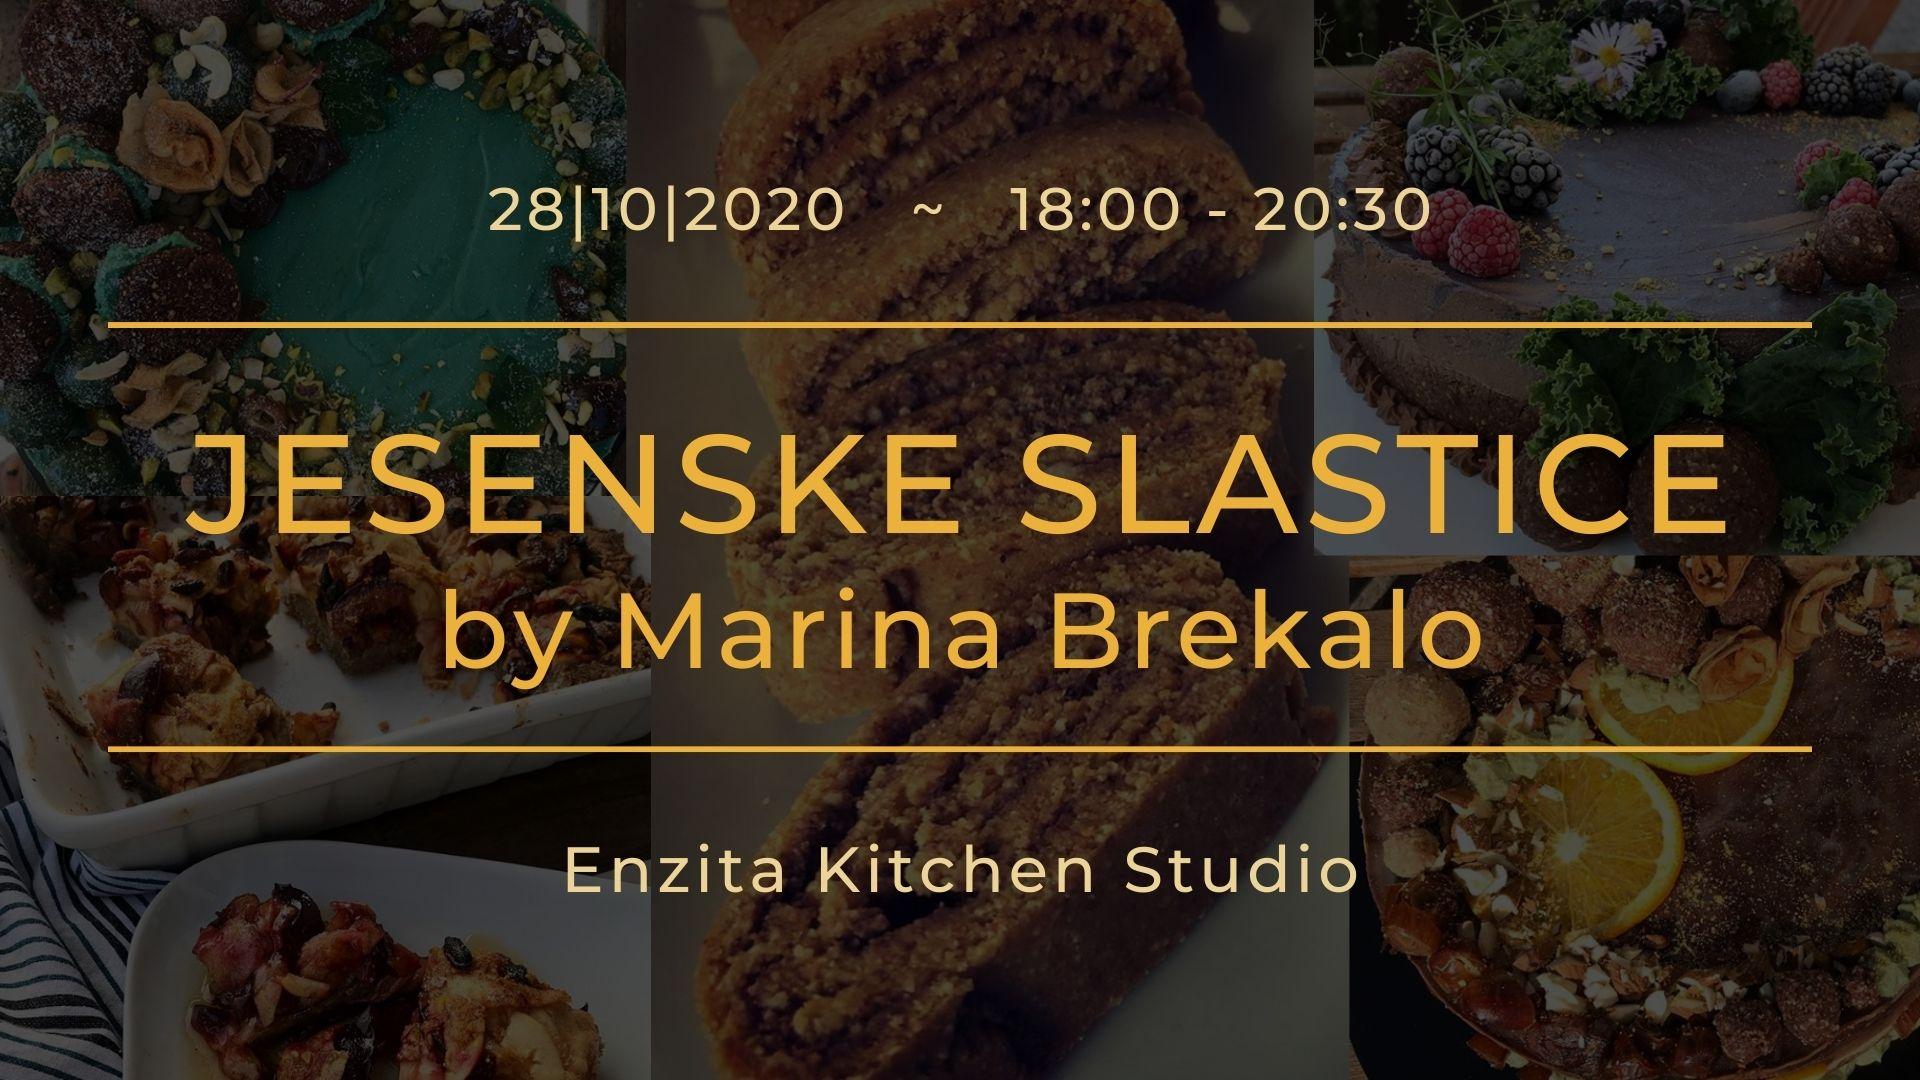 Jesenske slastice by Marina Brekalo